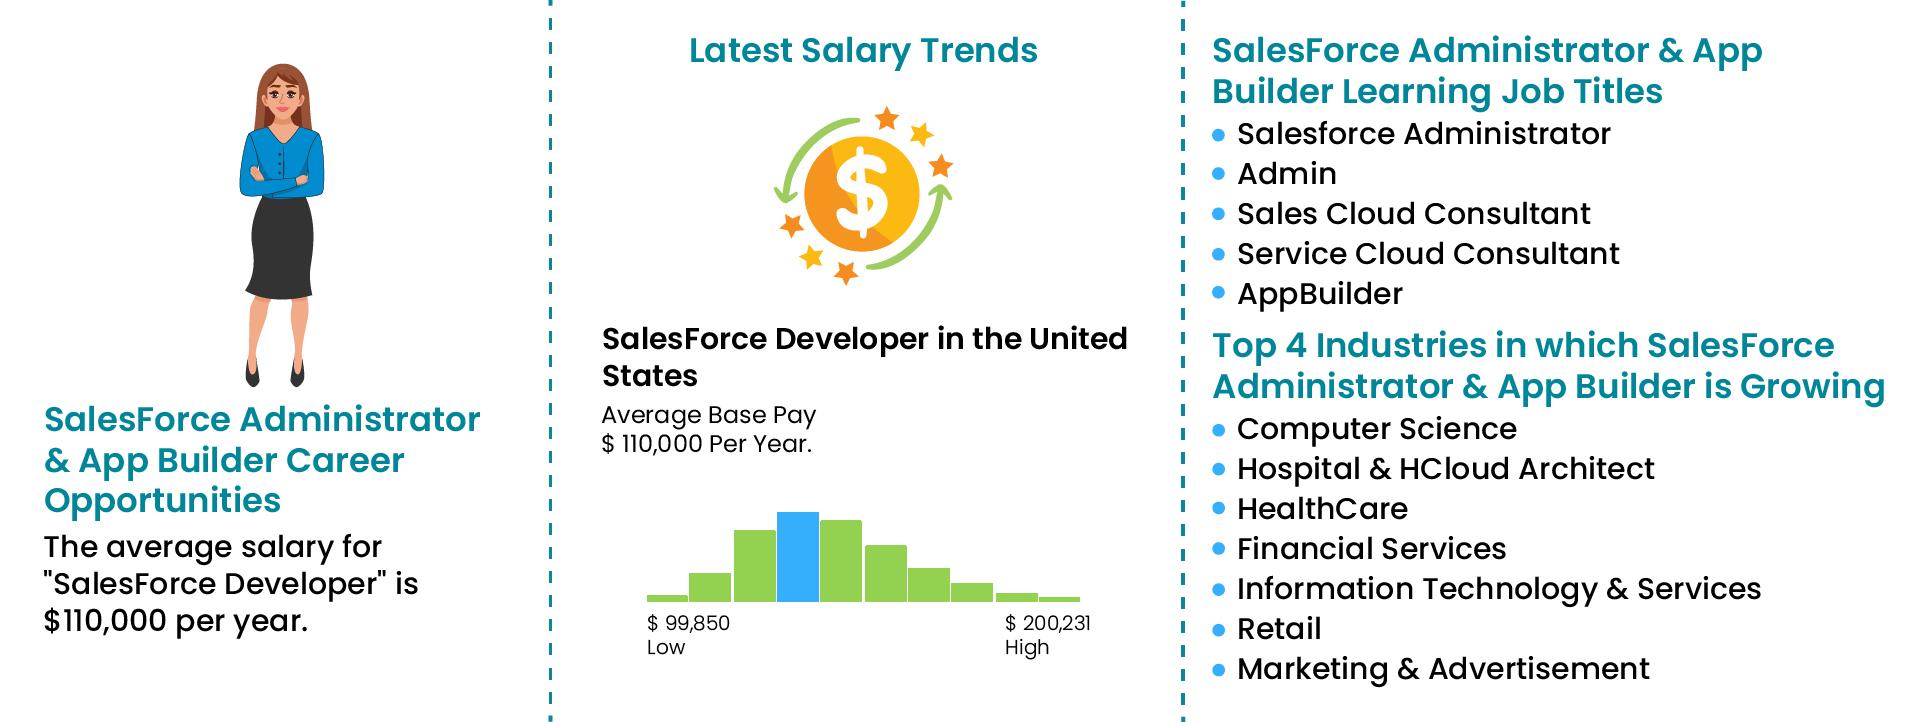 Salesforce certification Training-Joboutlook|ZaranTech